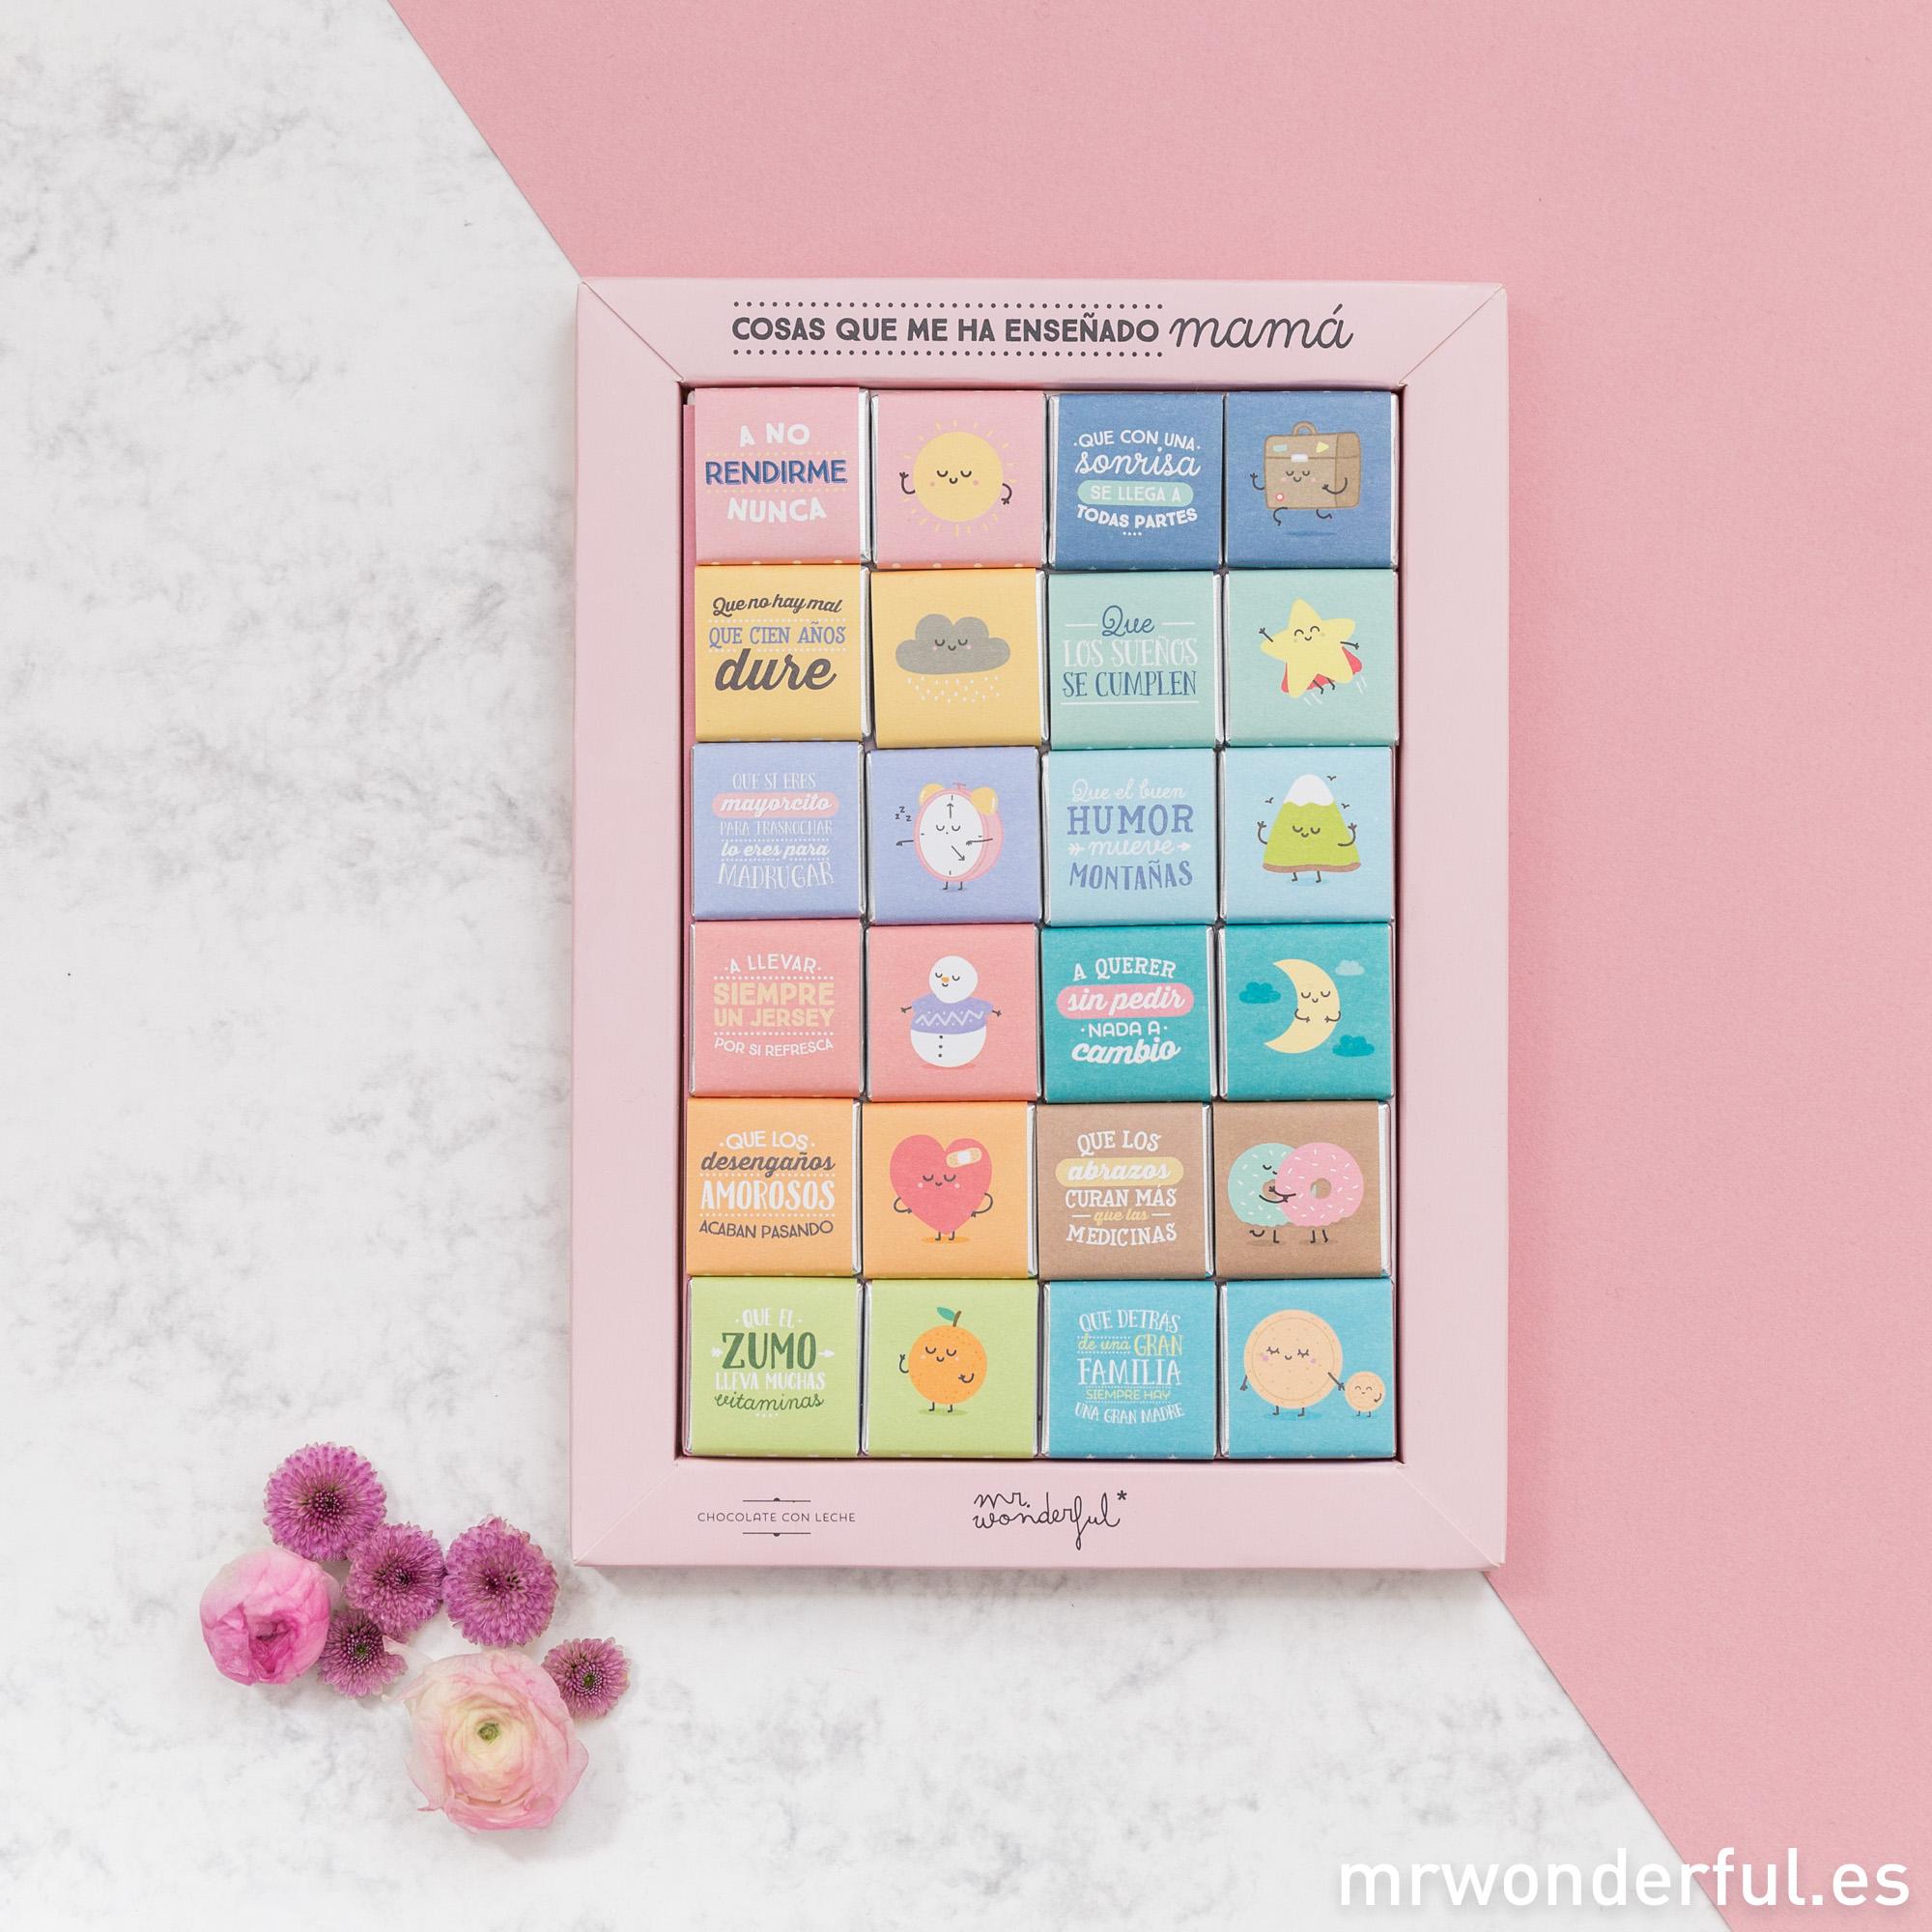 mrwonderful_chocolates-madre-11-editar